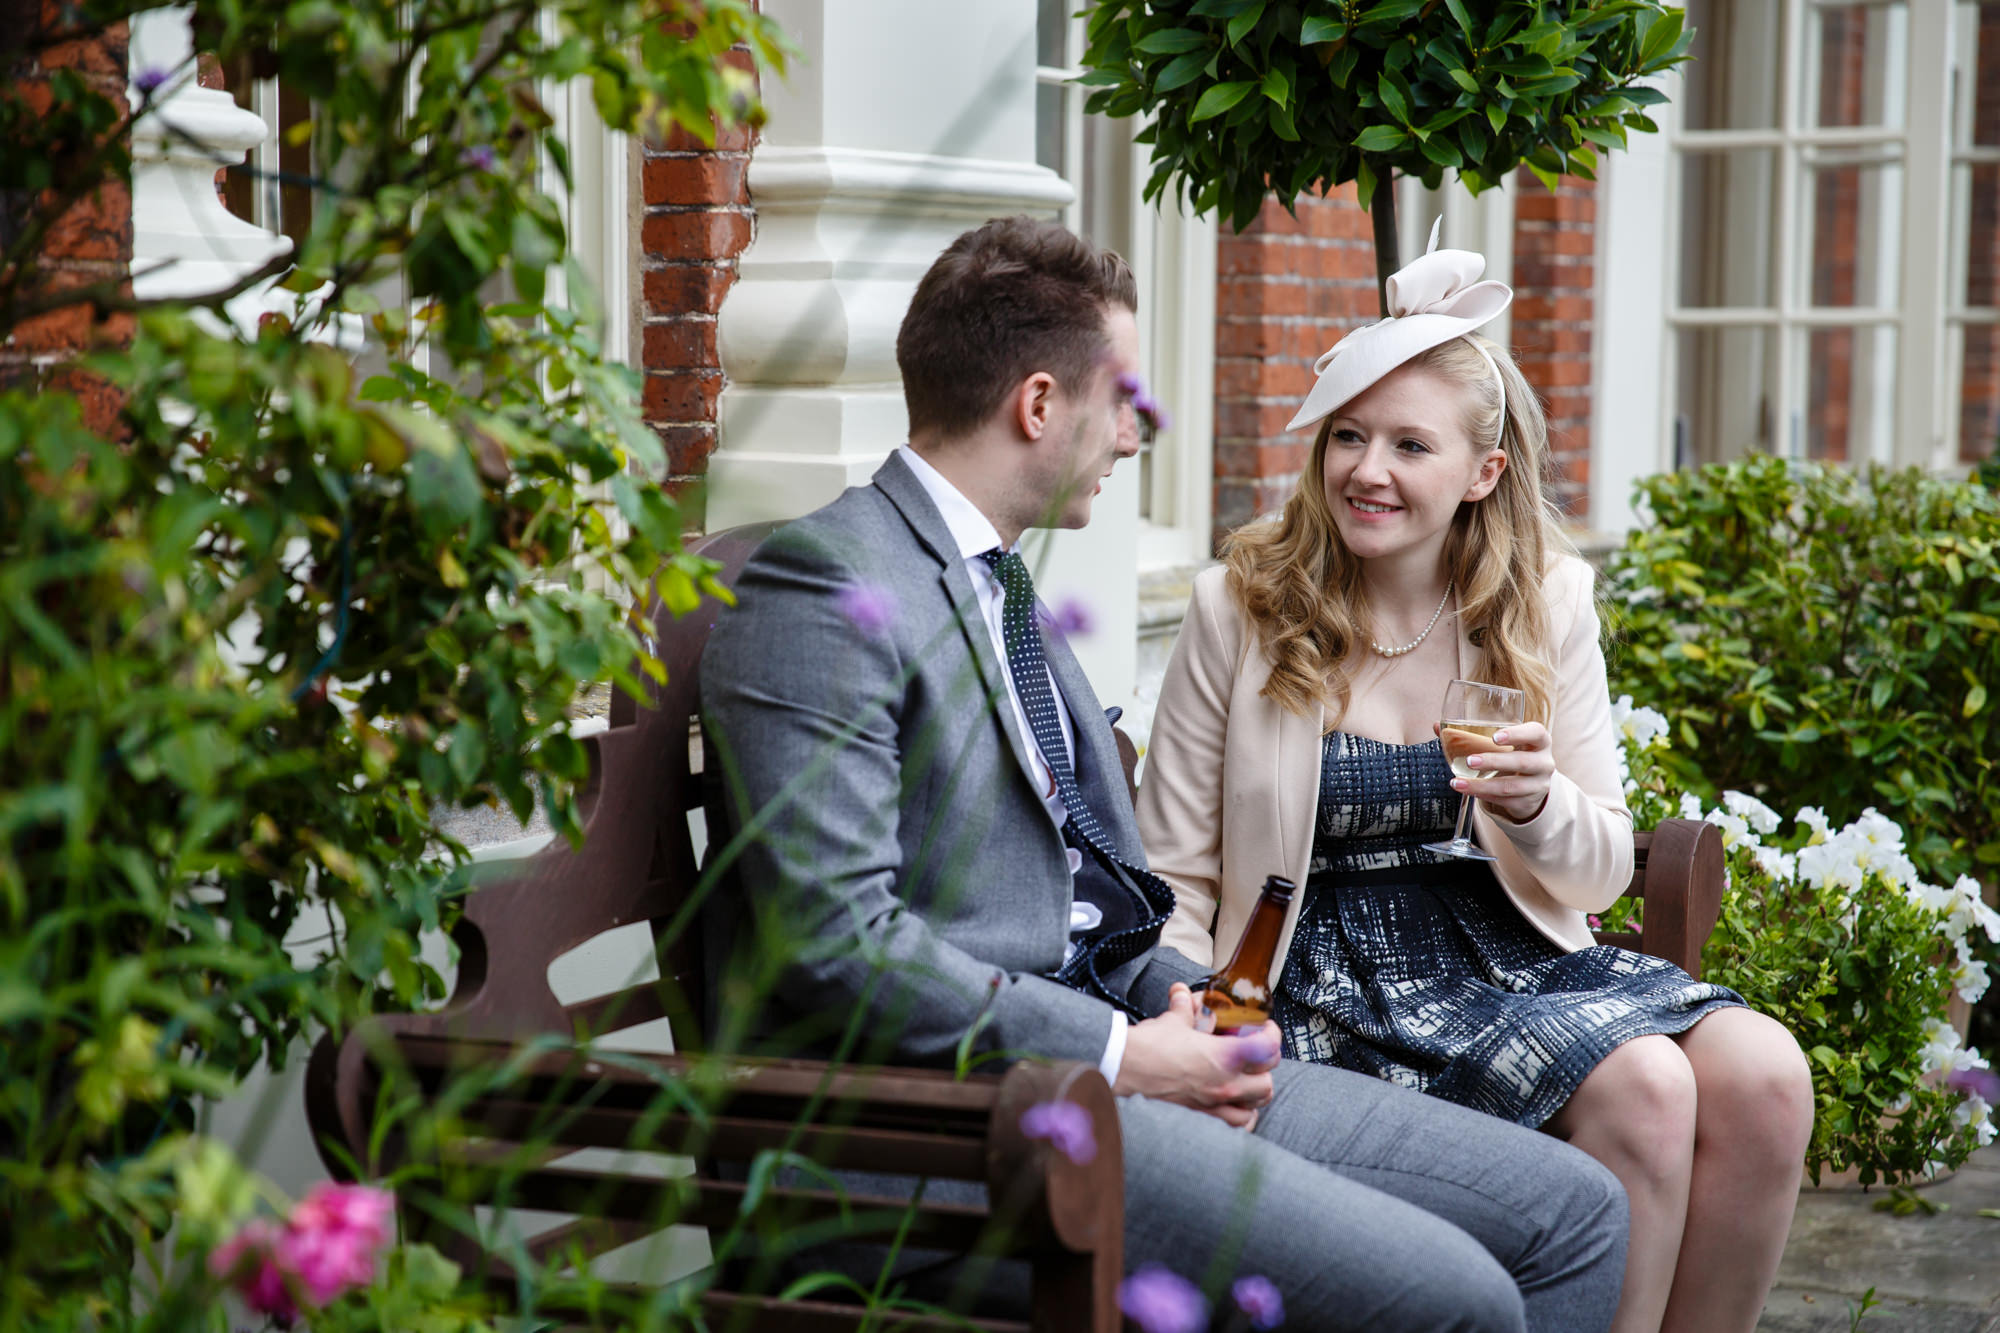 weddings at parklands essex